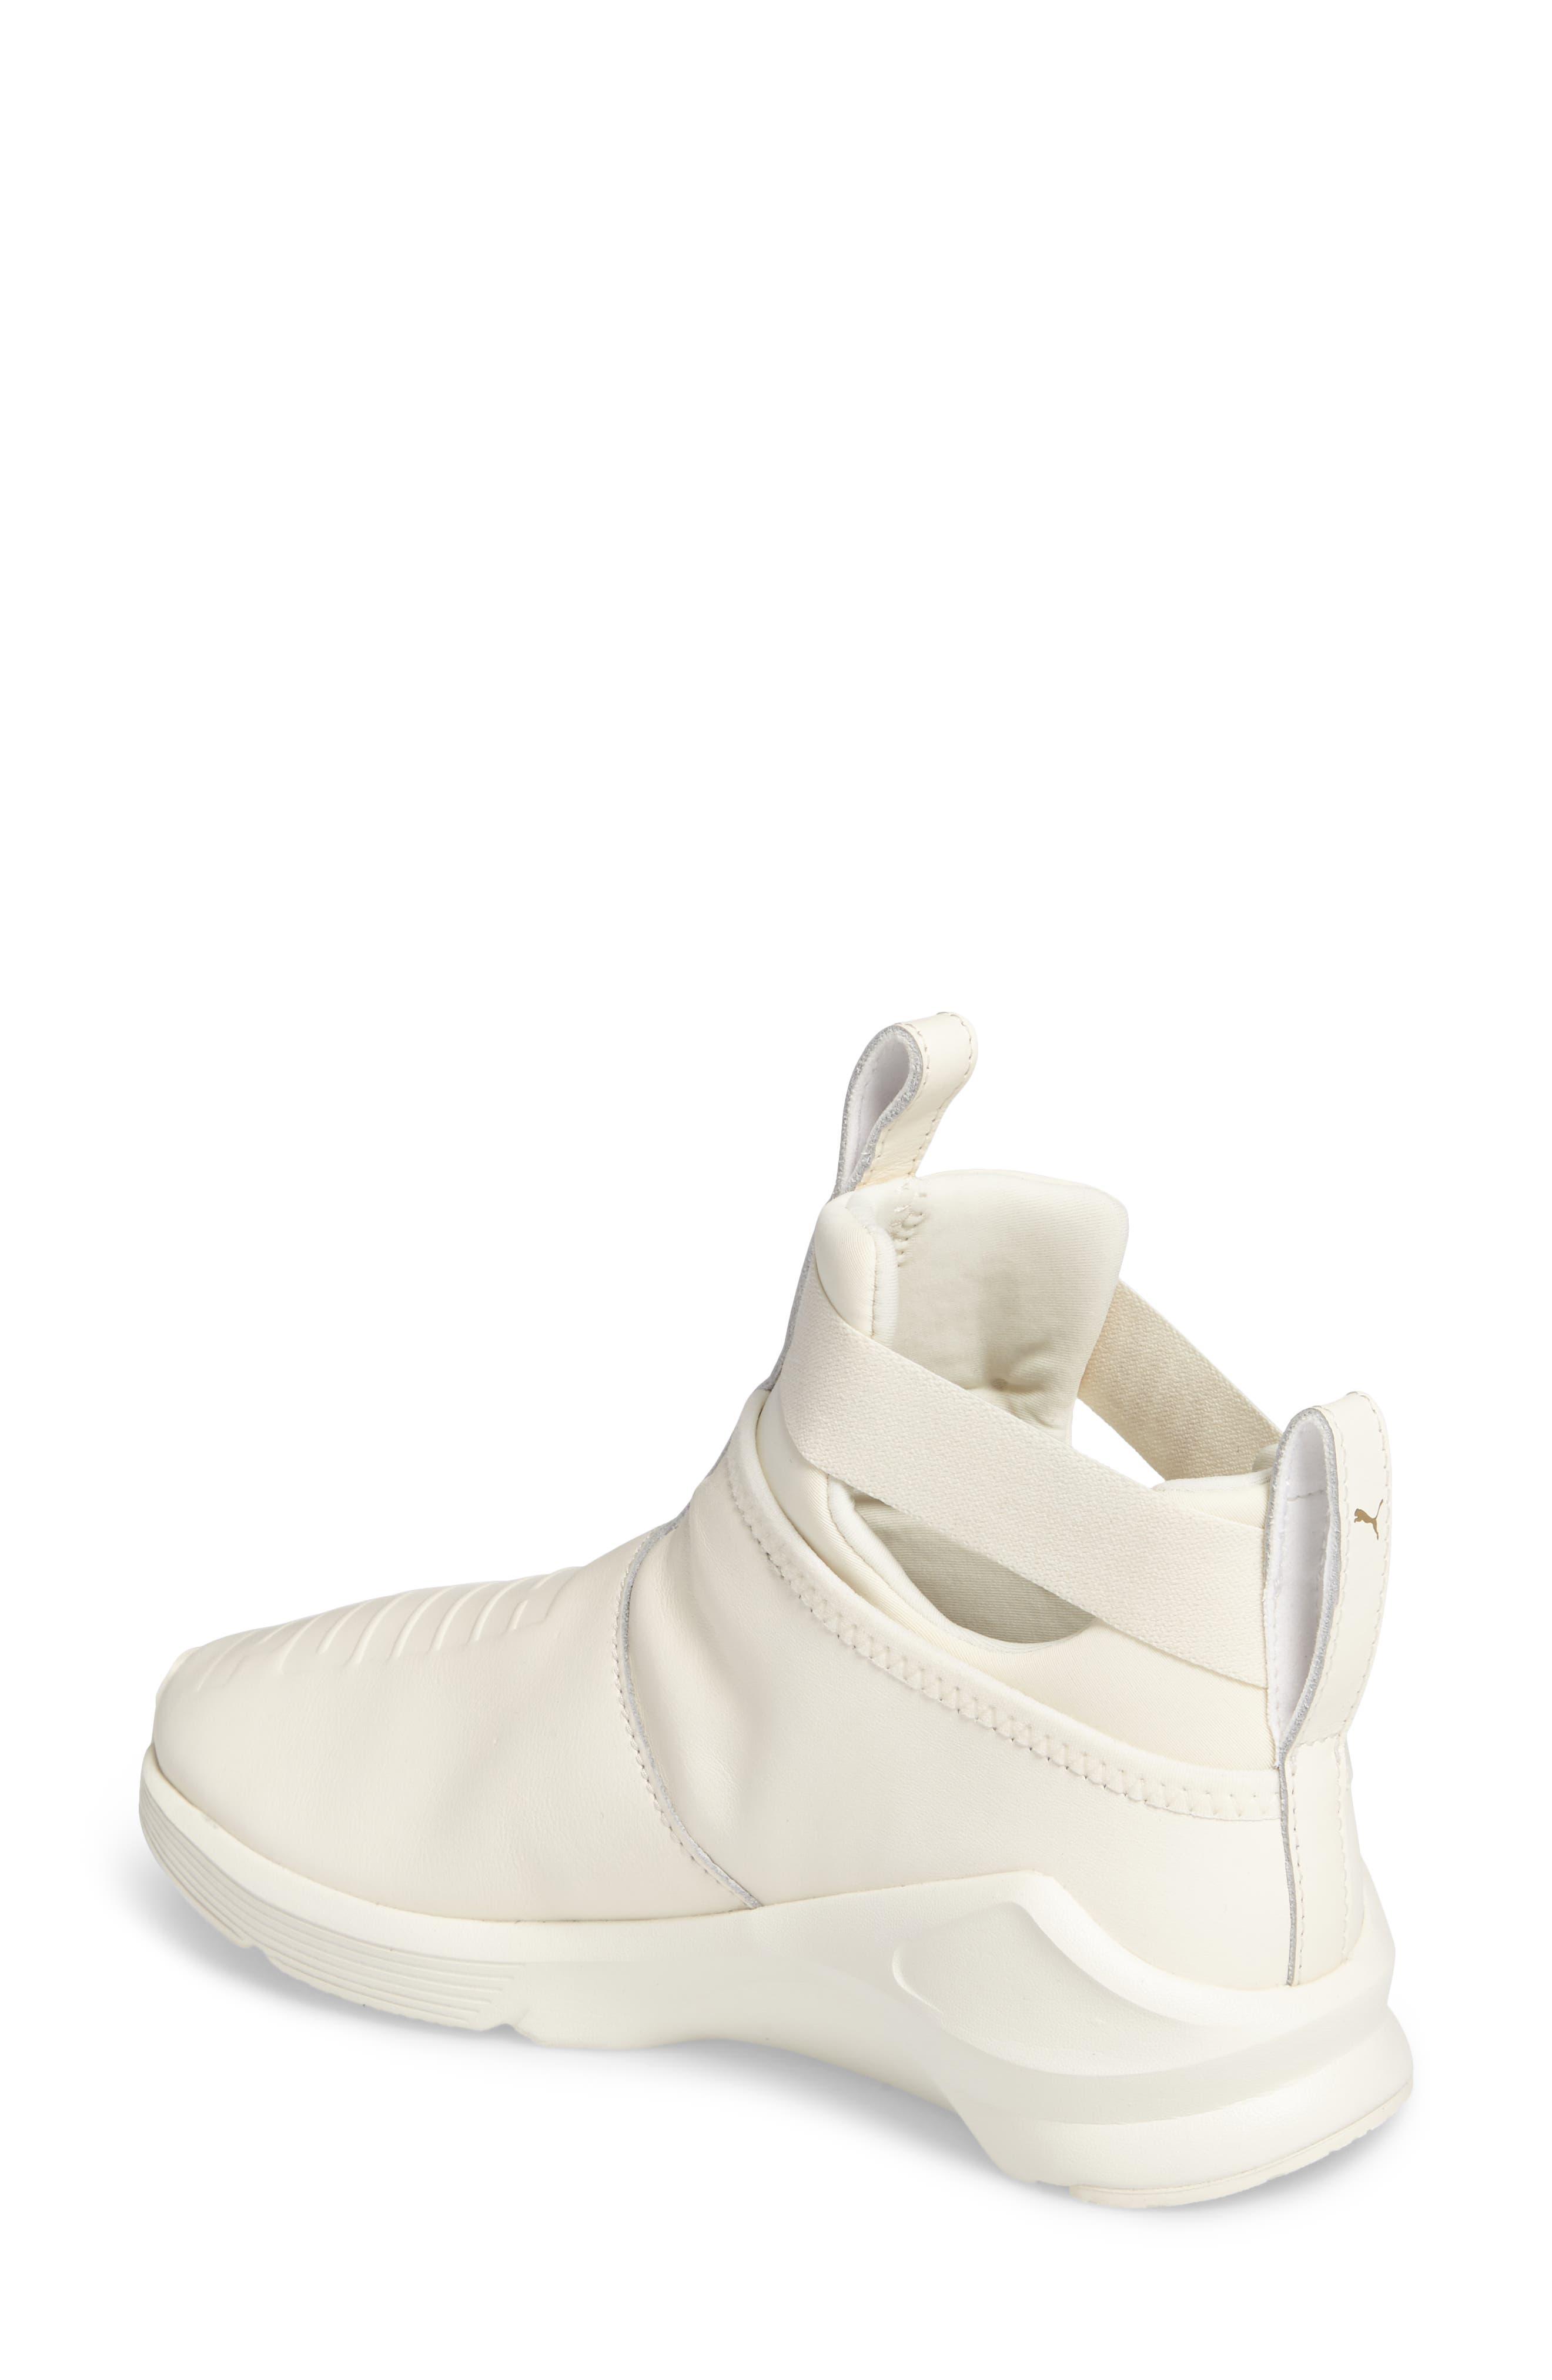 Fierce Strap Training Sneaker,                             Alternate thumbnail 13, color,